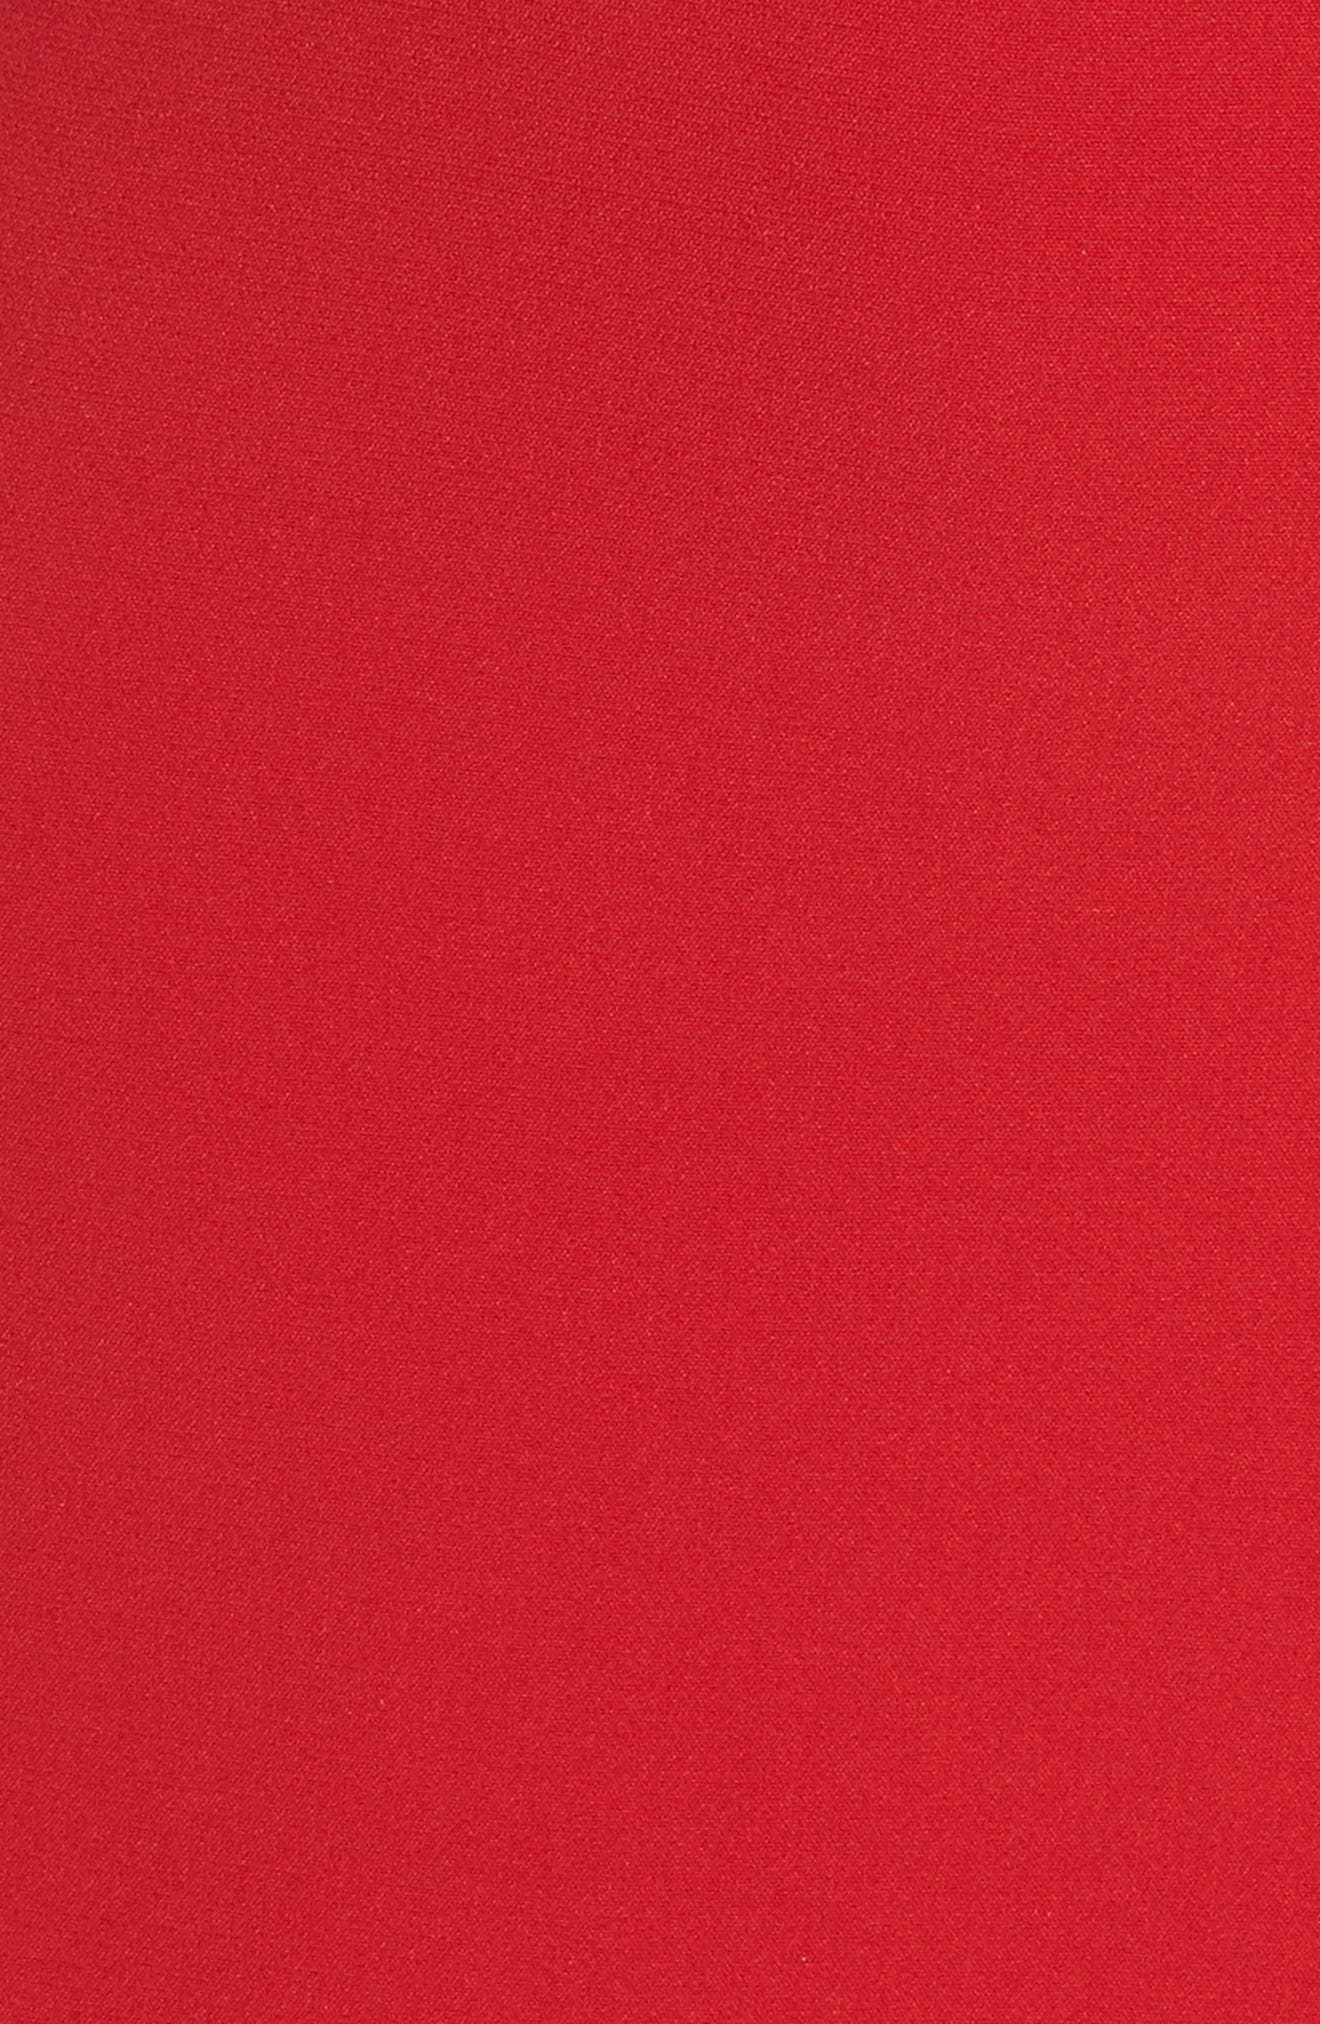 Halter Asymmetrical Sheath Dress,                             Alternate thumbnail 6, color,                             600